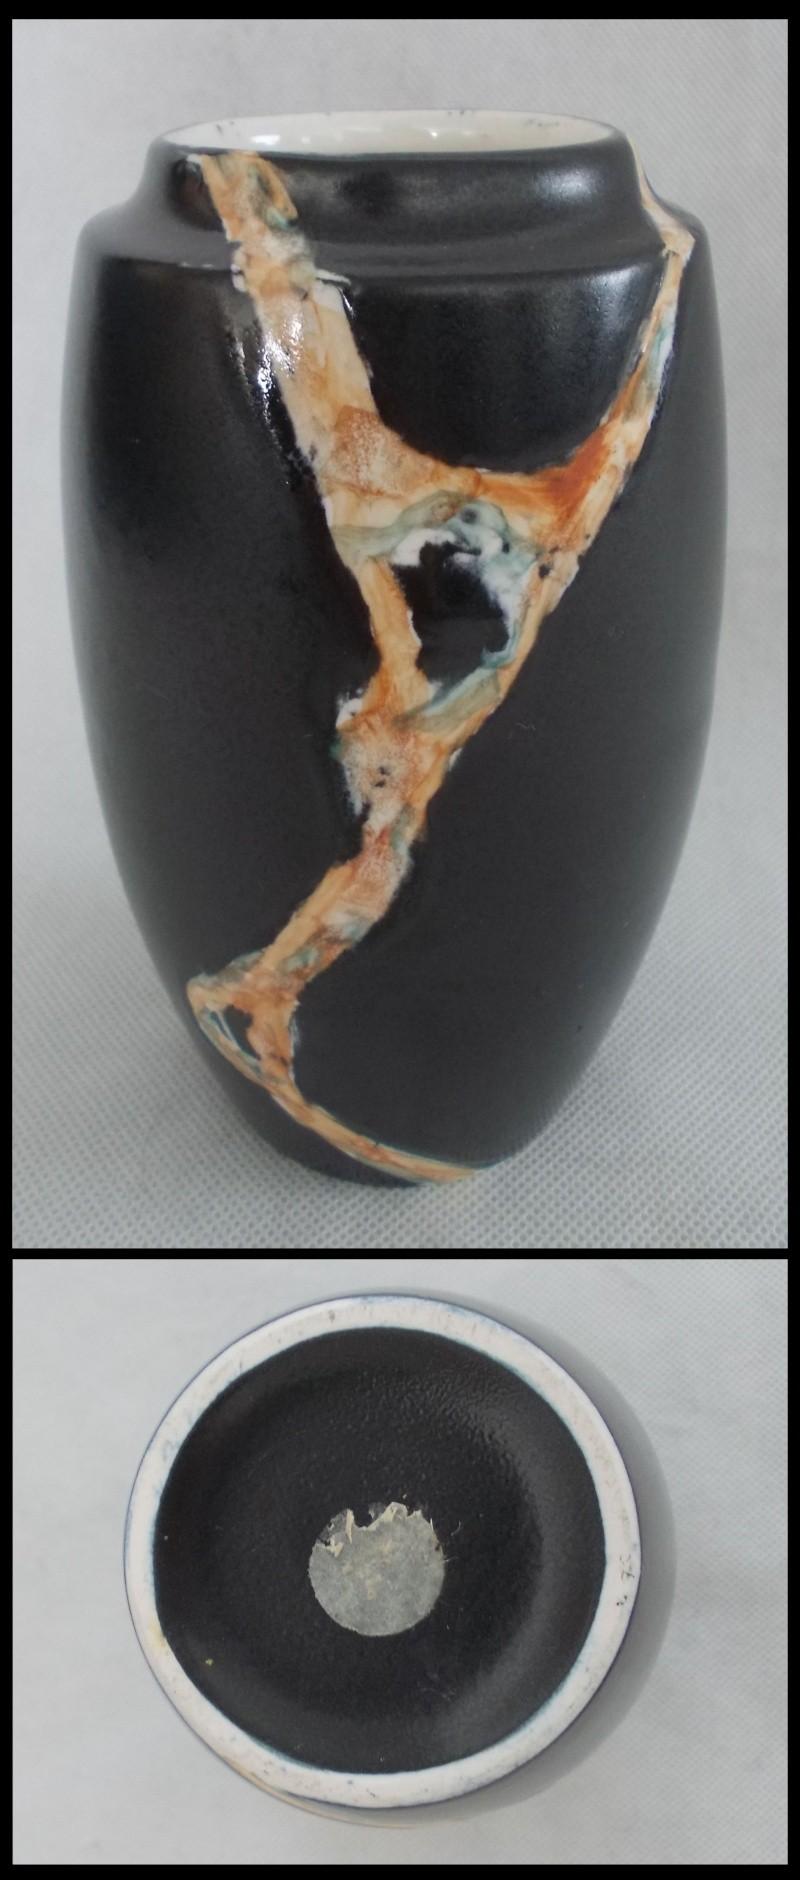 Titian black marble glaze vase for gallery Dscn7320